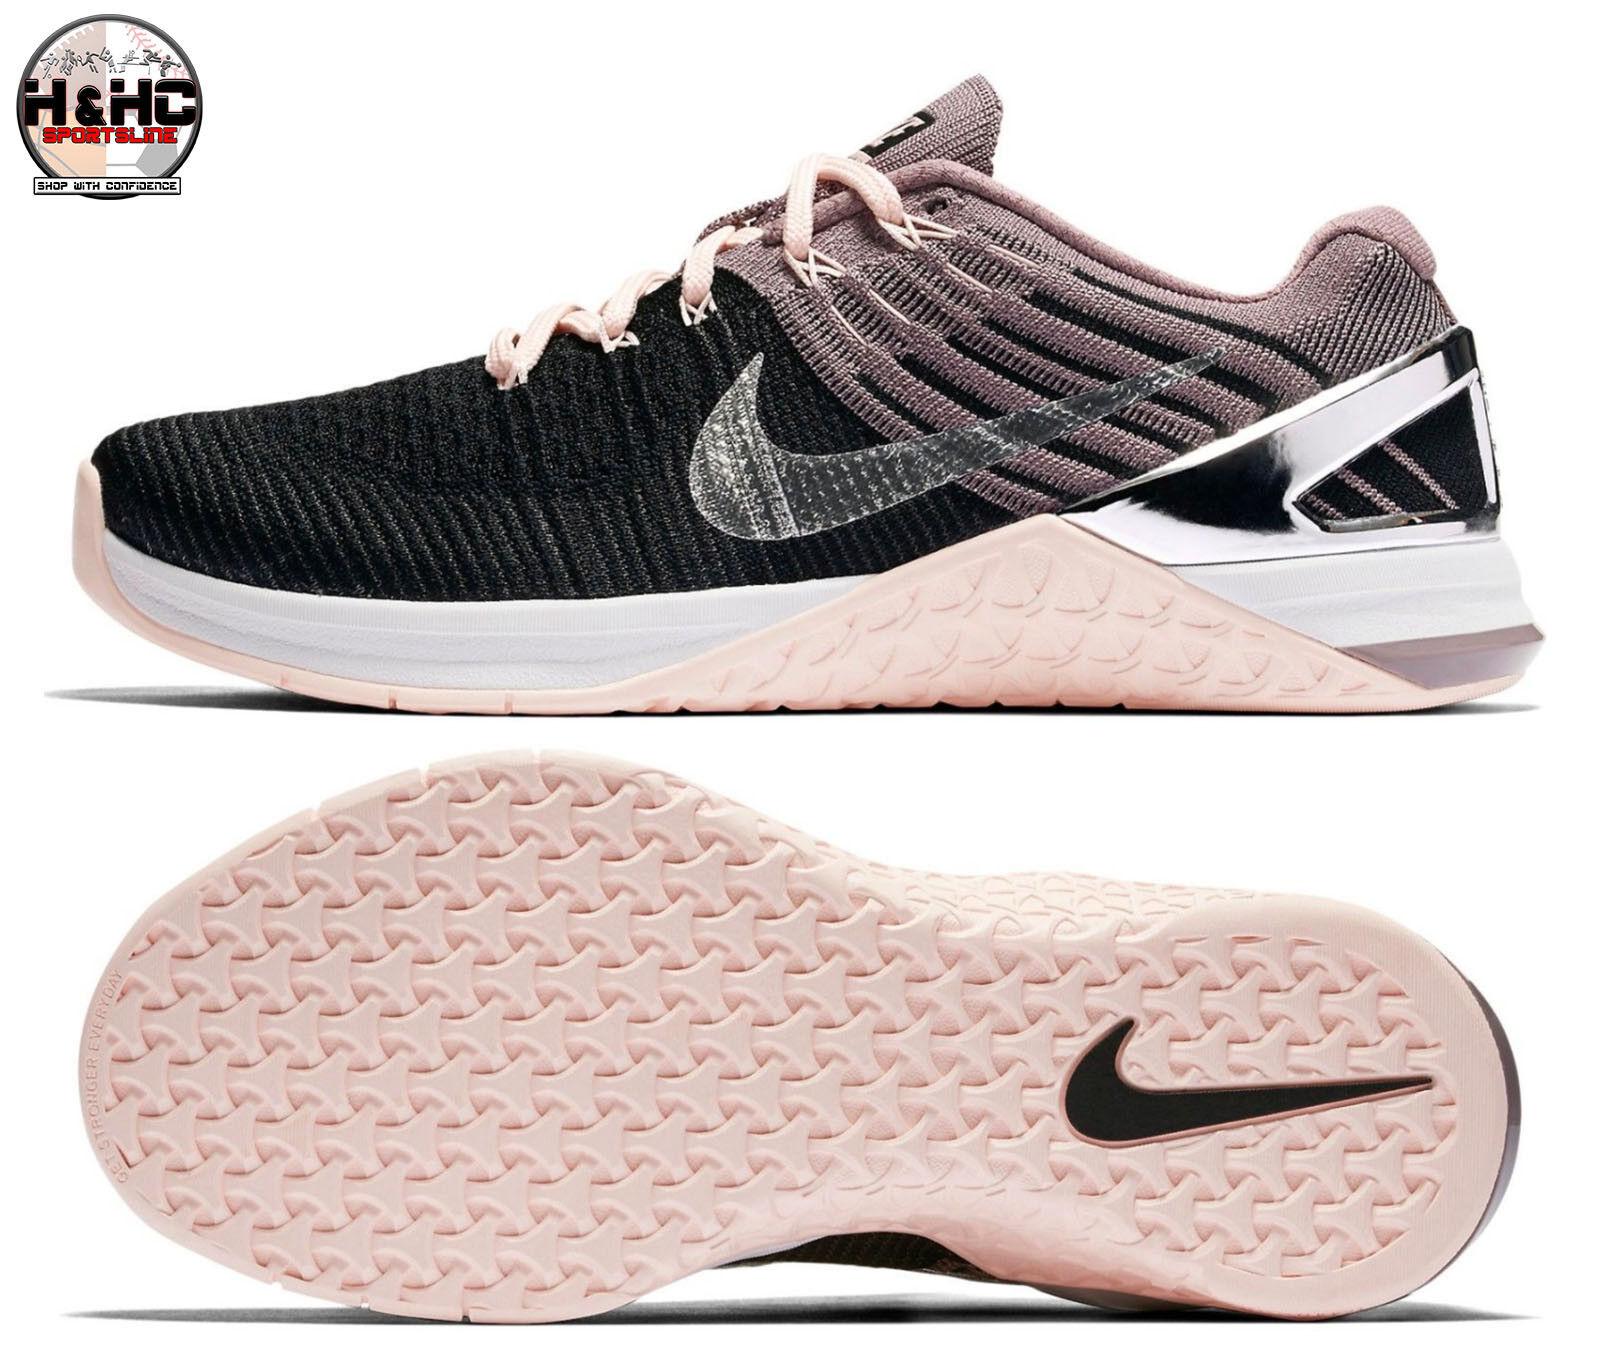 Nike Nike Nike Metcon DSX FK Bionic 904659 001 Black Chrome Women's Training shoes Sz 14 6e702f